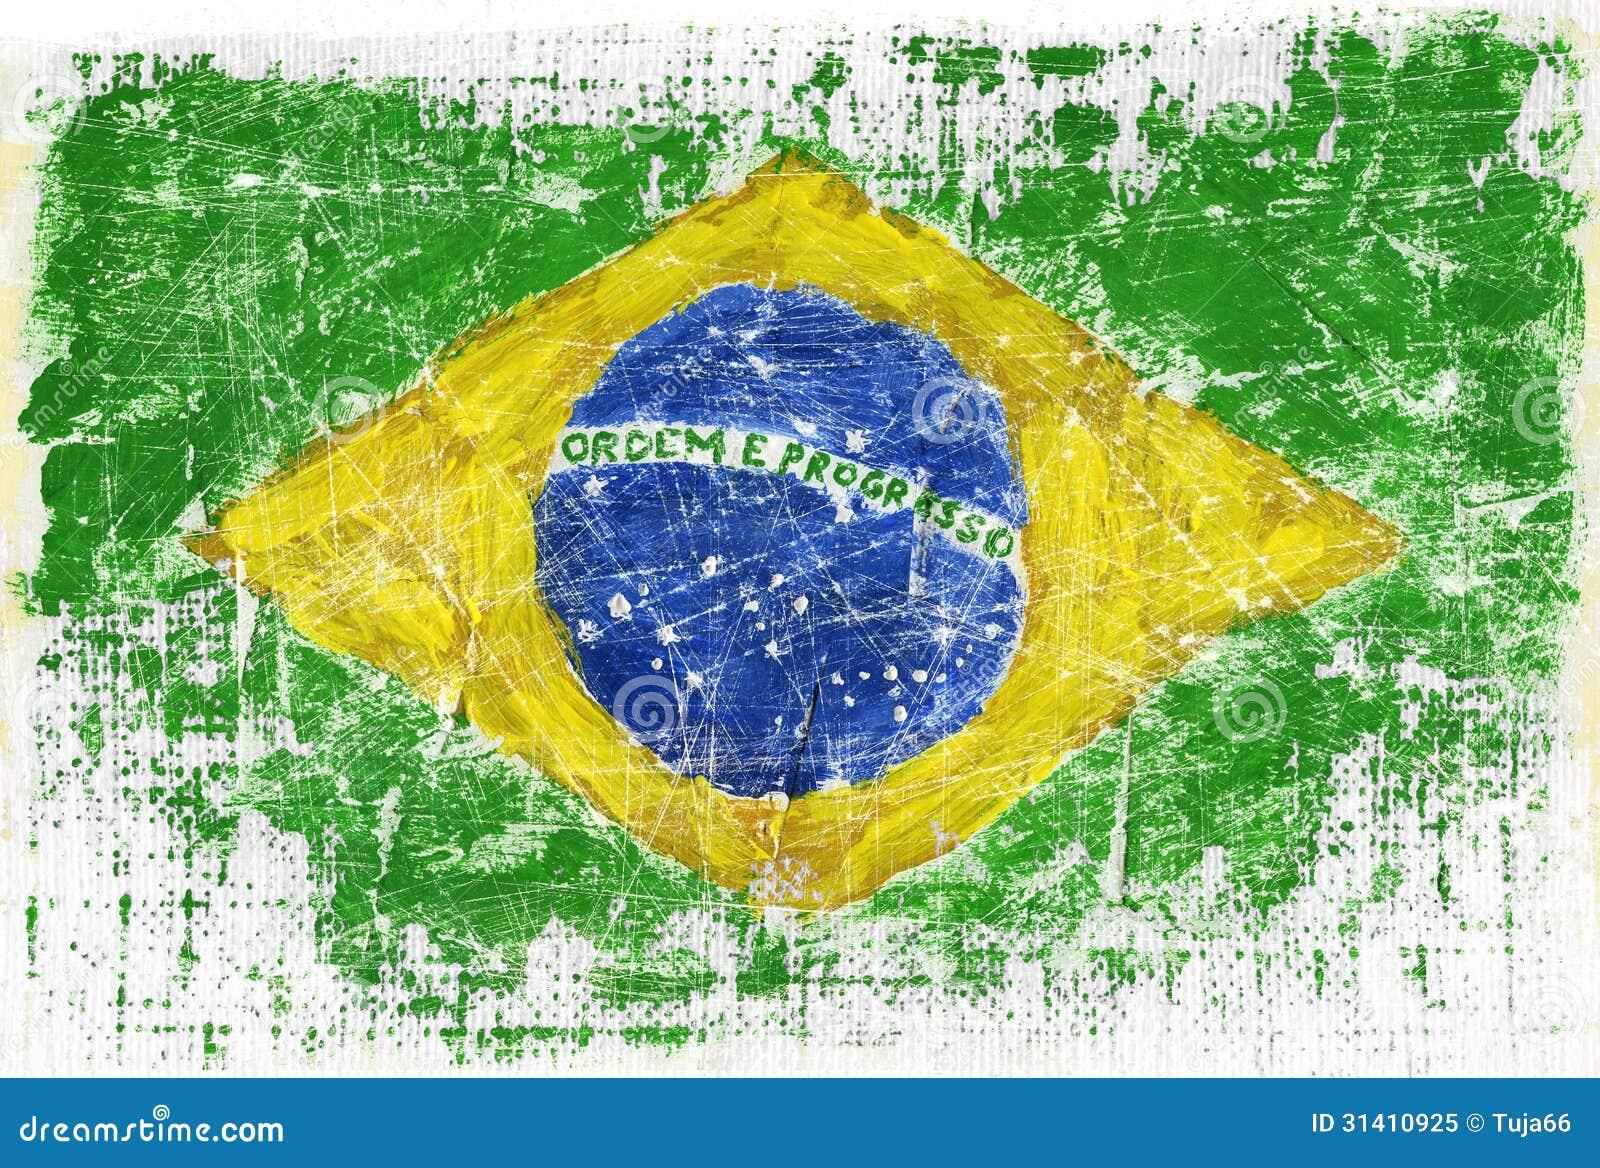 Handmade watercolor brazil flag brasil stock photos freeimages com - Royalty Free Stock Photo Brazil Flag